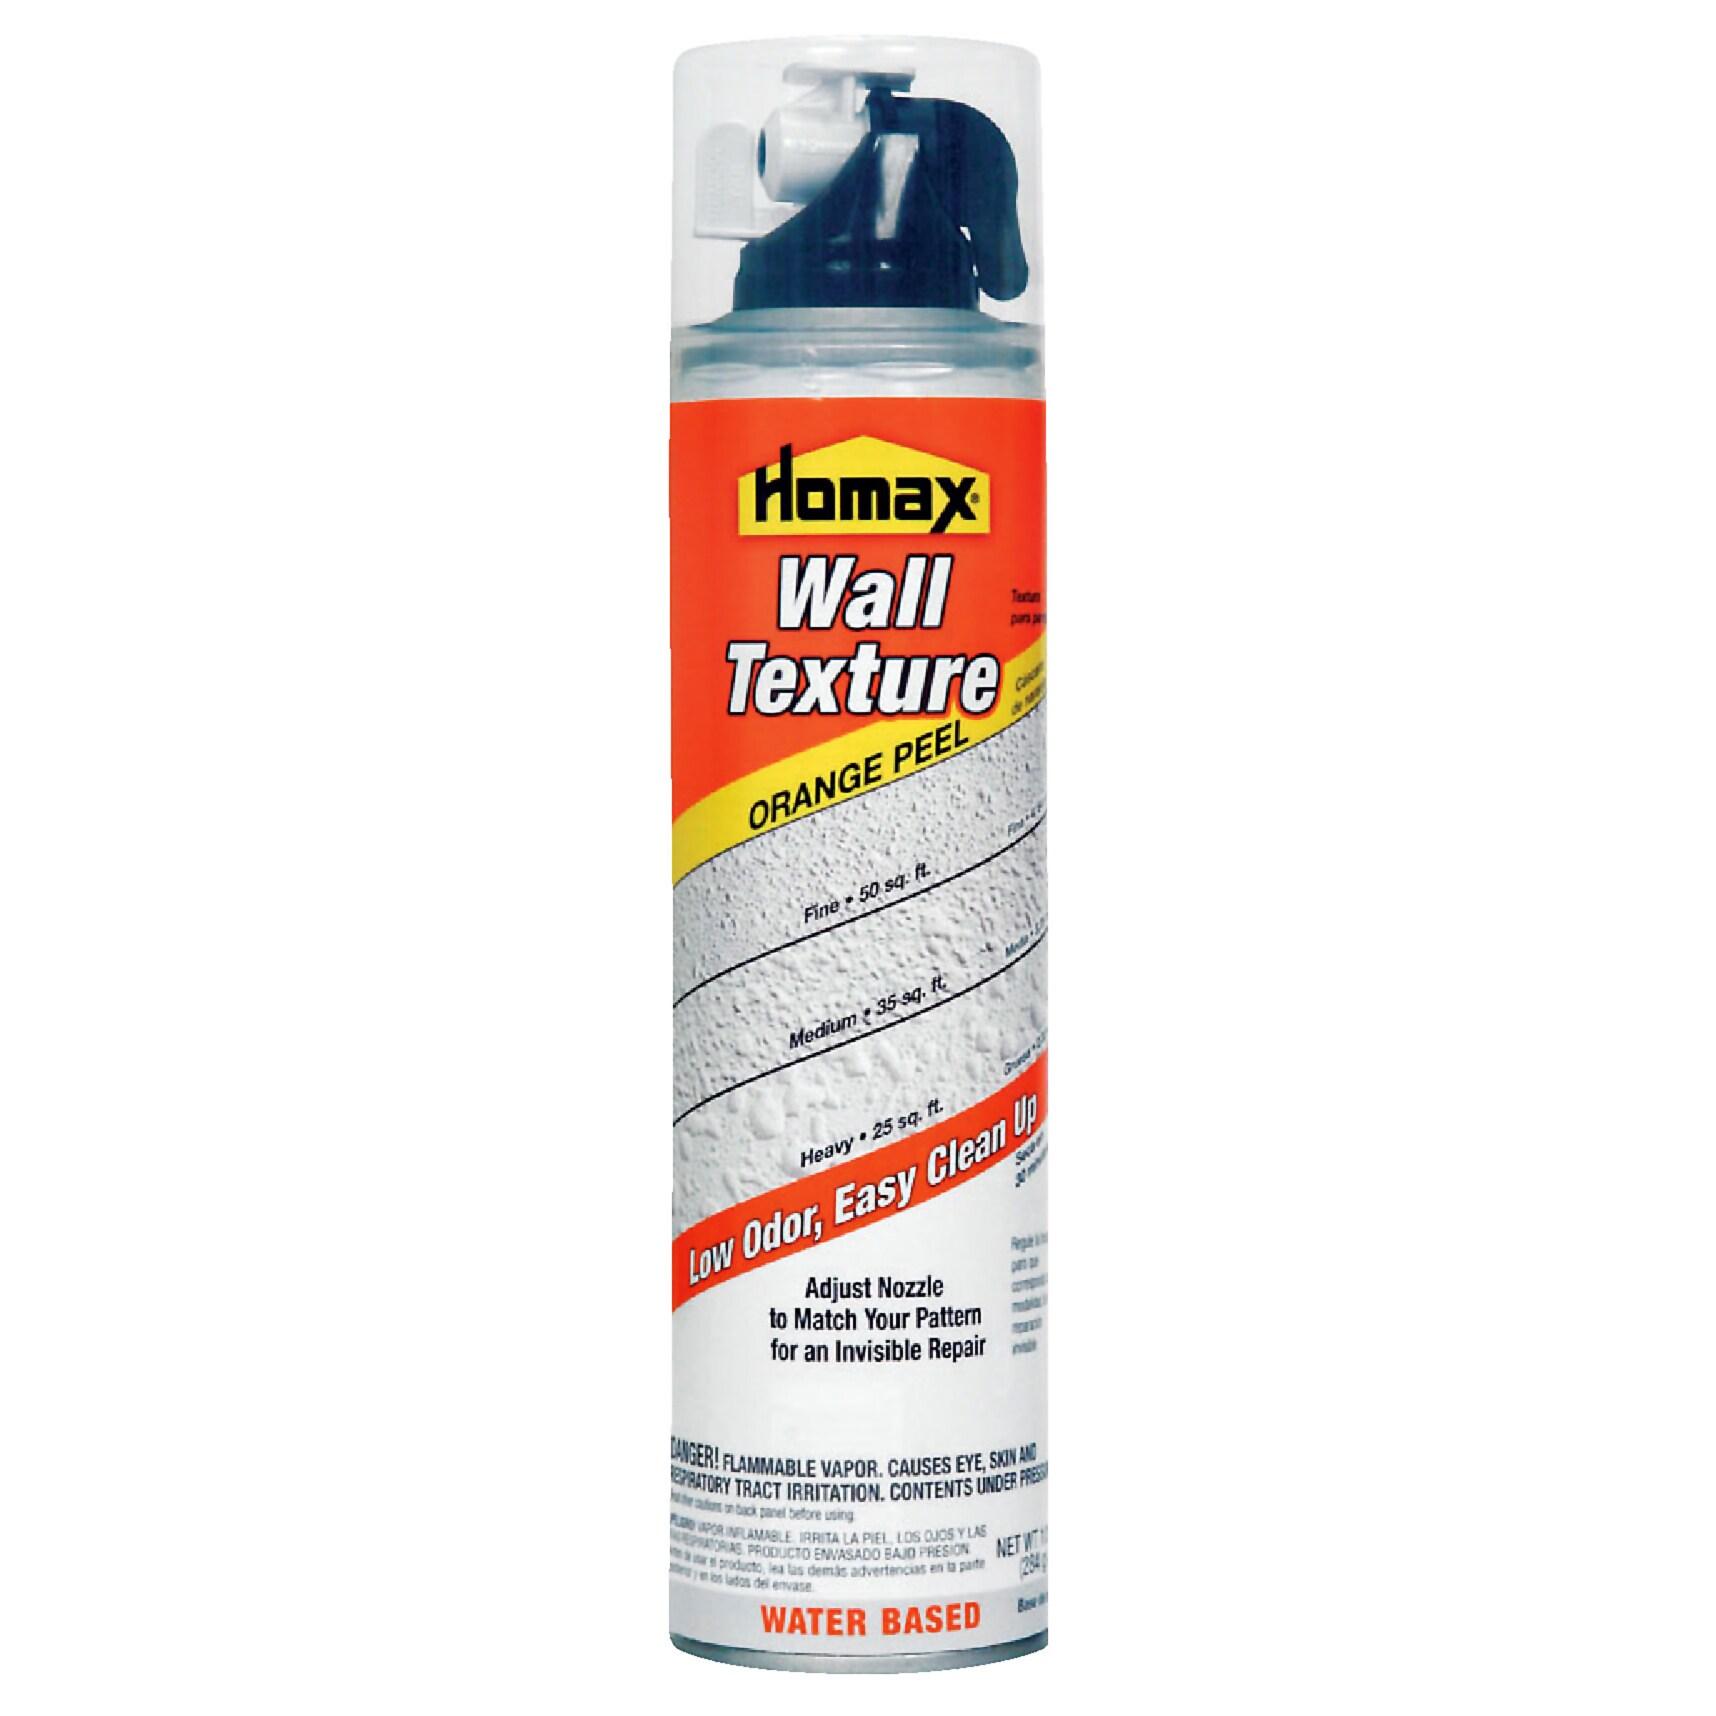 Homax 4091-06 10 Oz Orange Peel Water Based Wall Texture ...